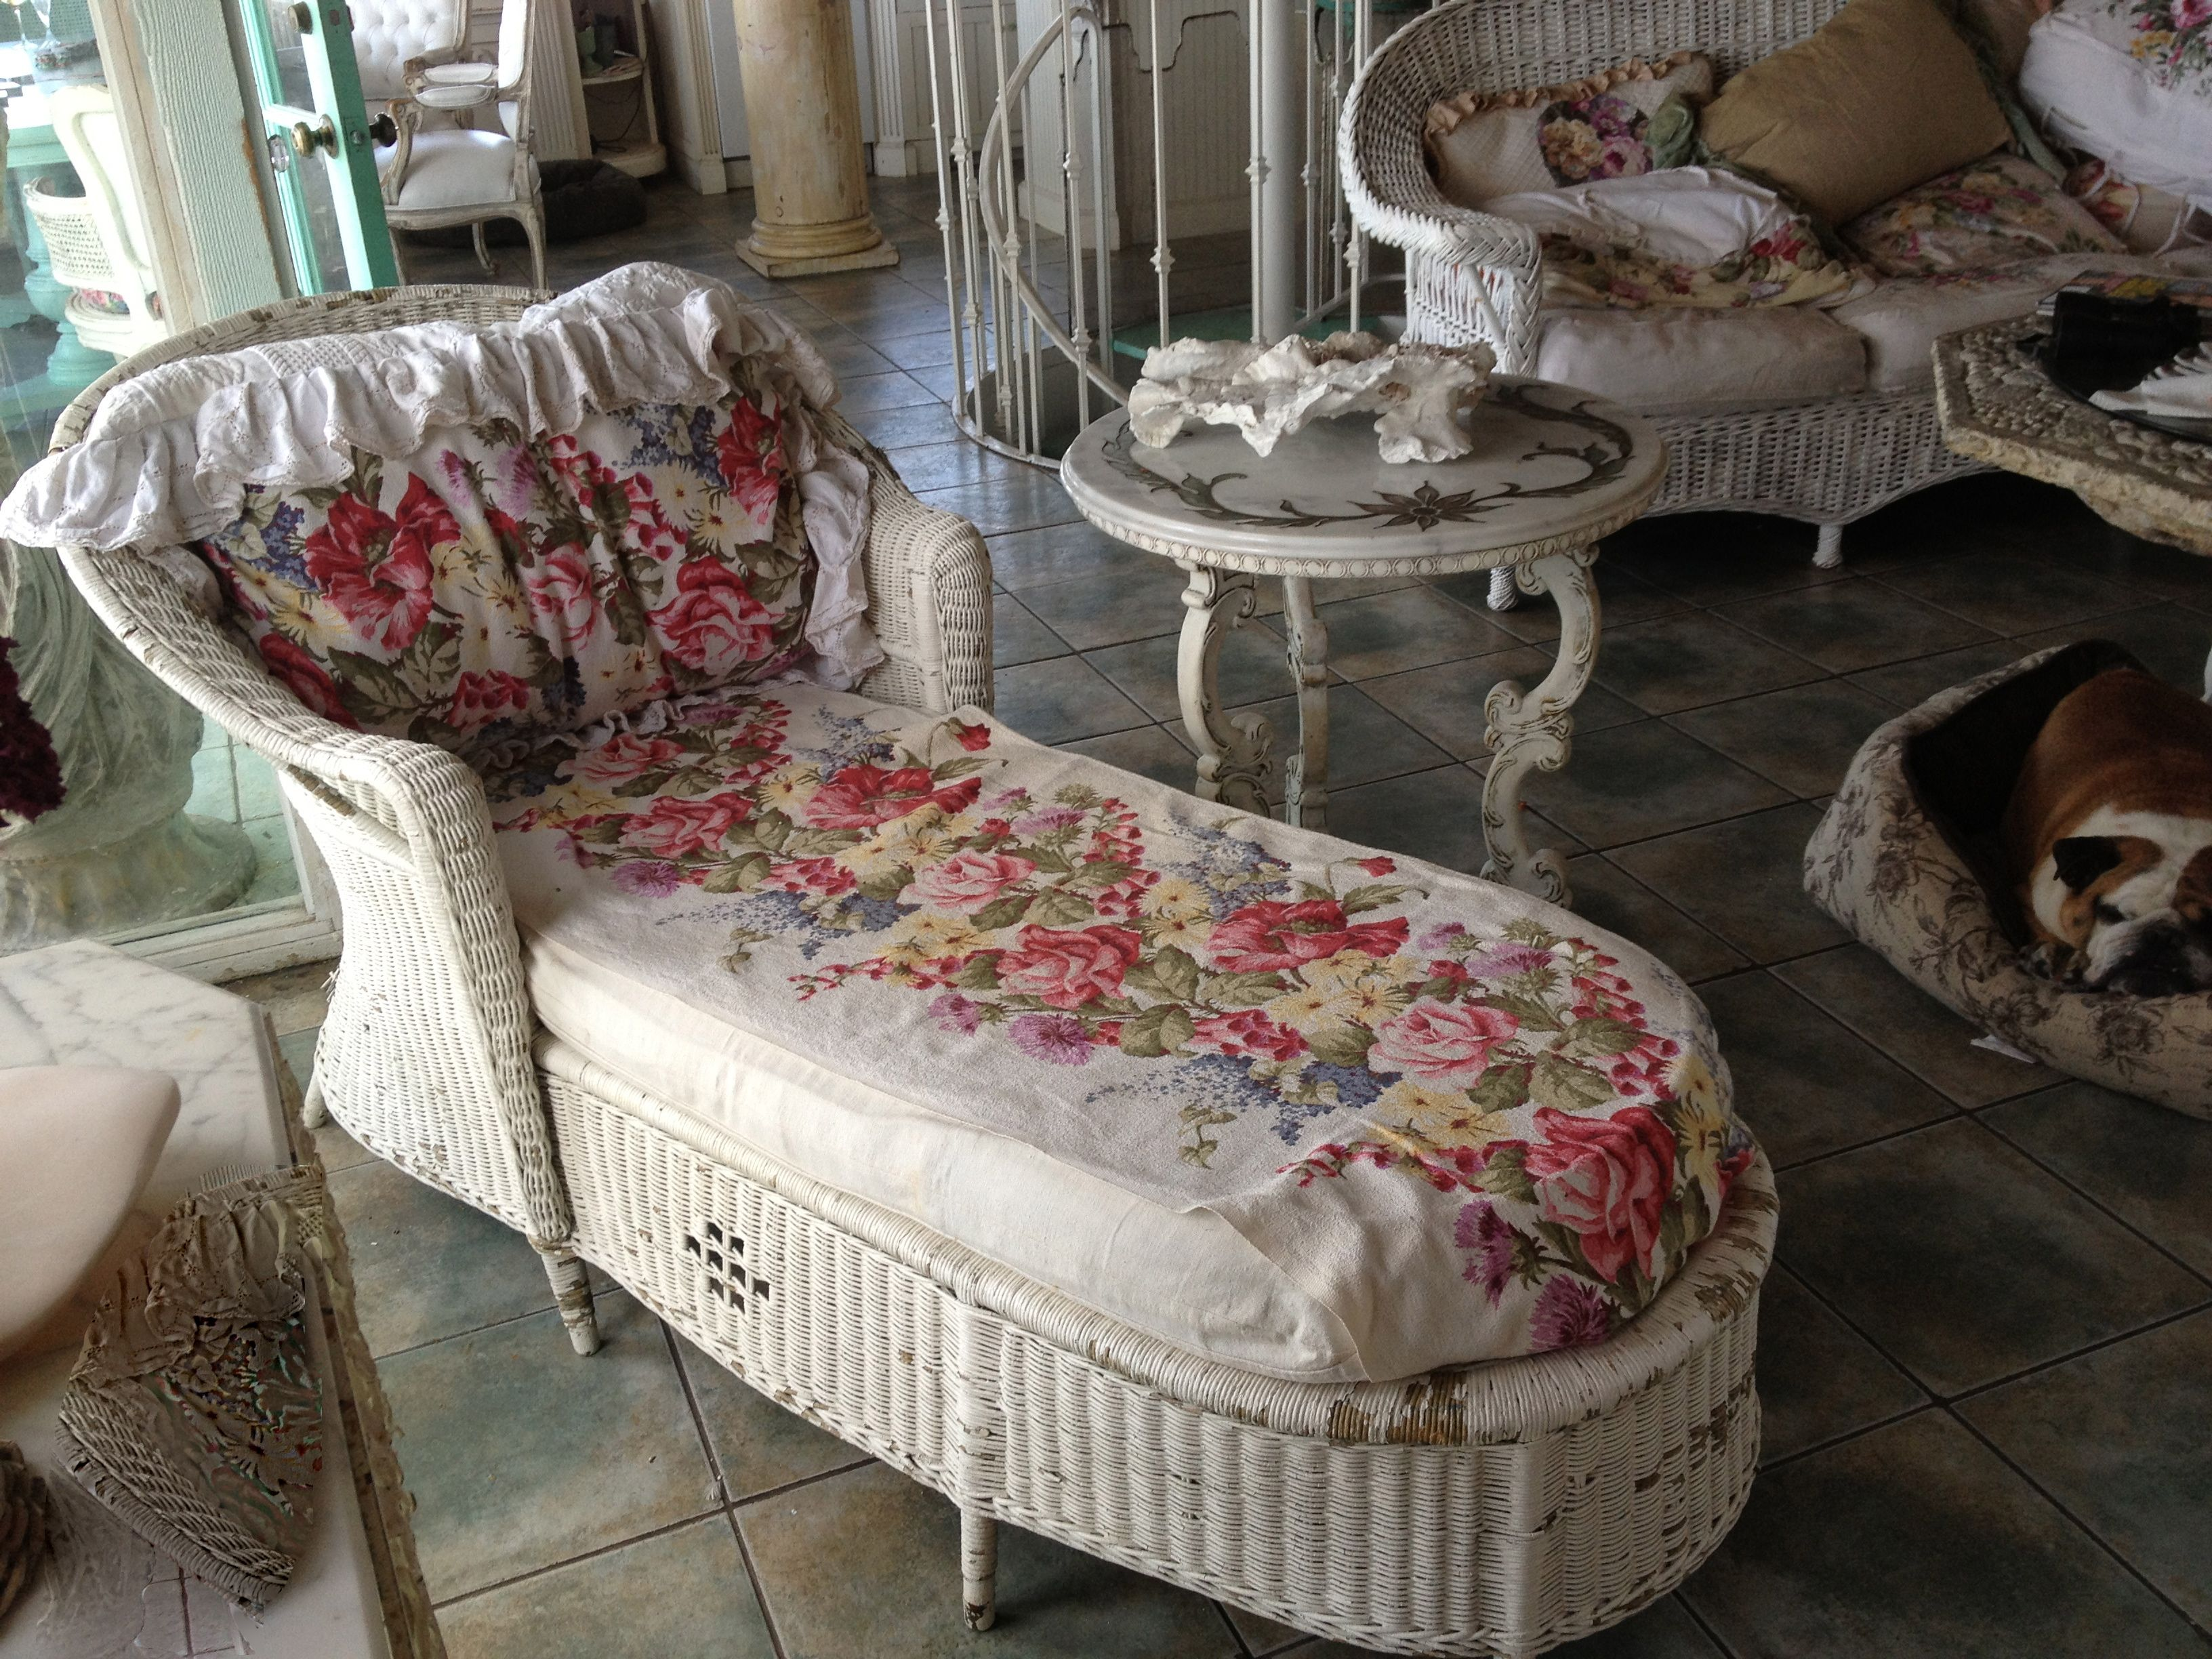 Antique Wicker Chaise Lounge Wicker Chaise Lounge White Wicker